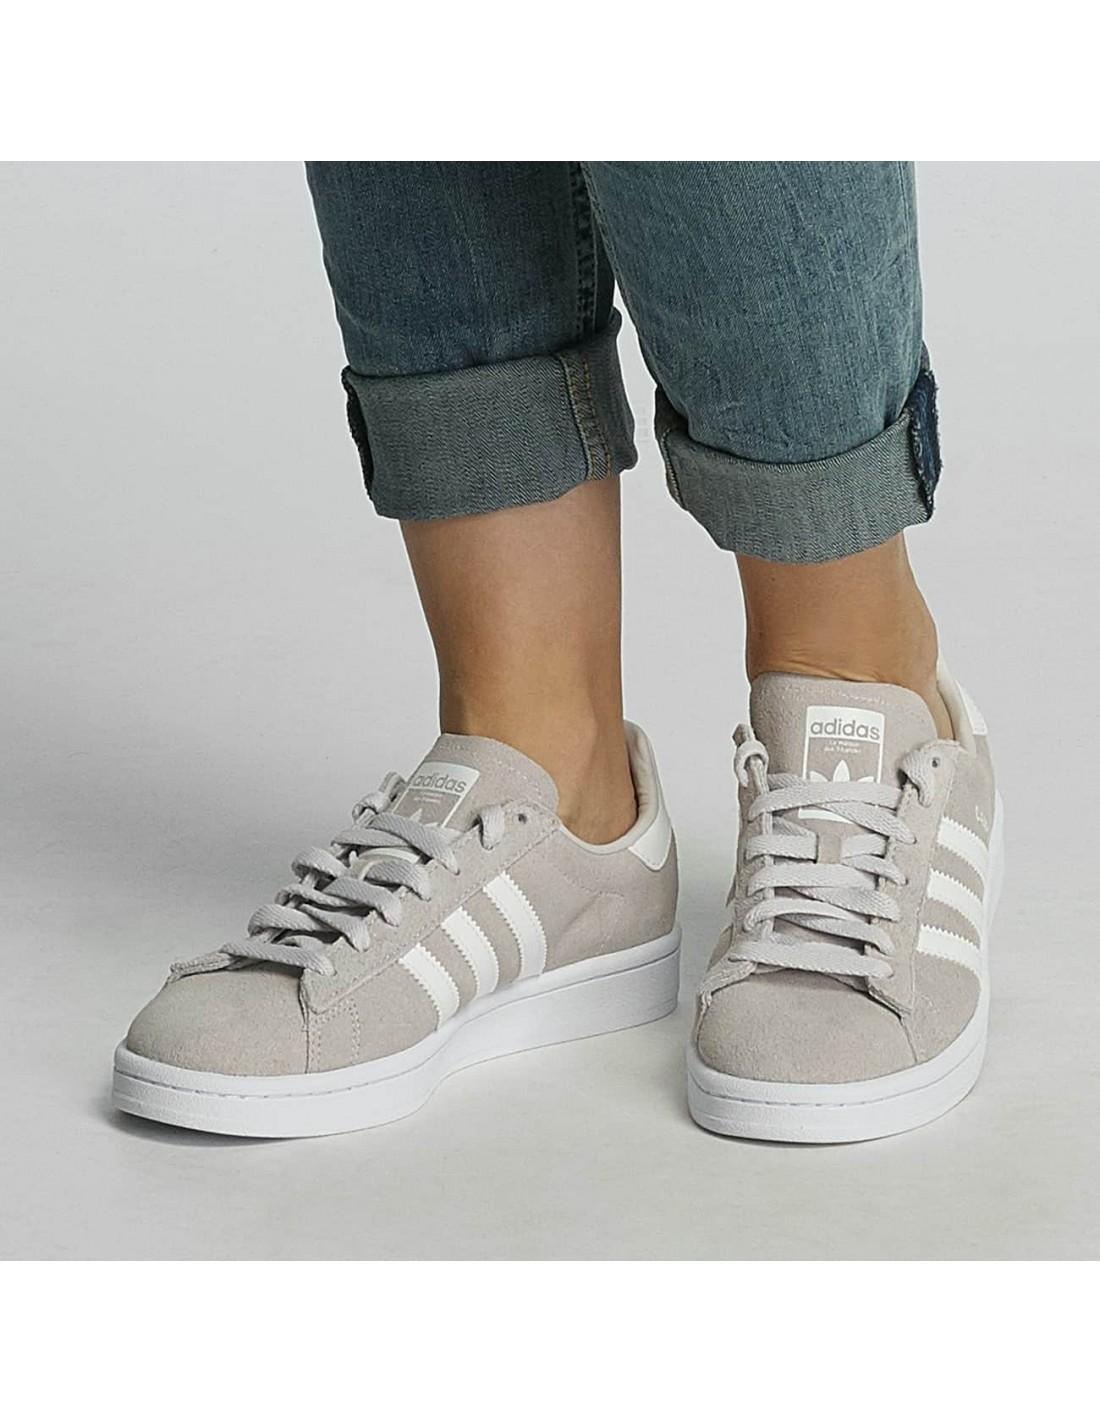 Adidas Originals Campus Shoes Grey (BY9576)| urbanfashion.gr